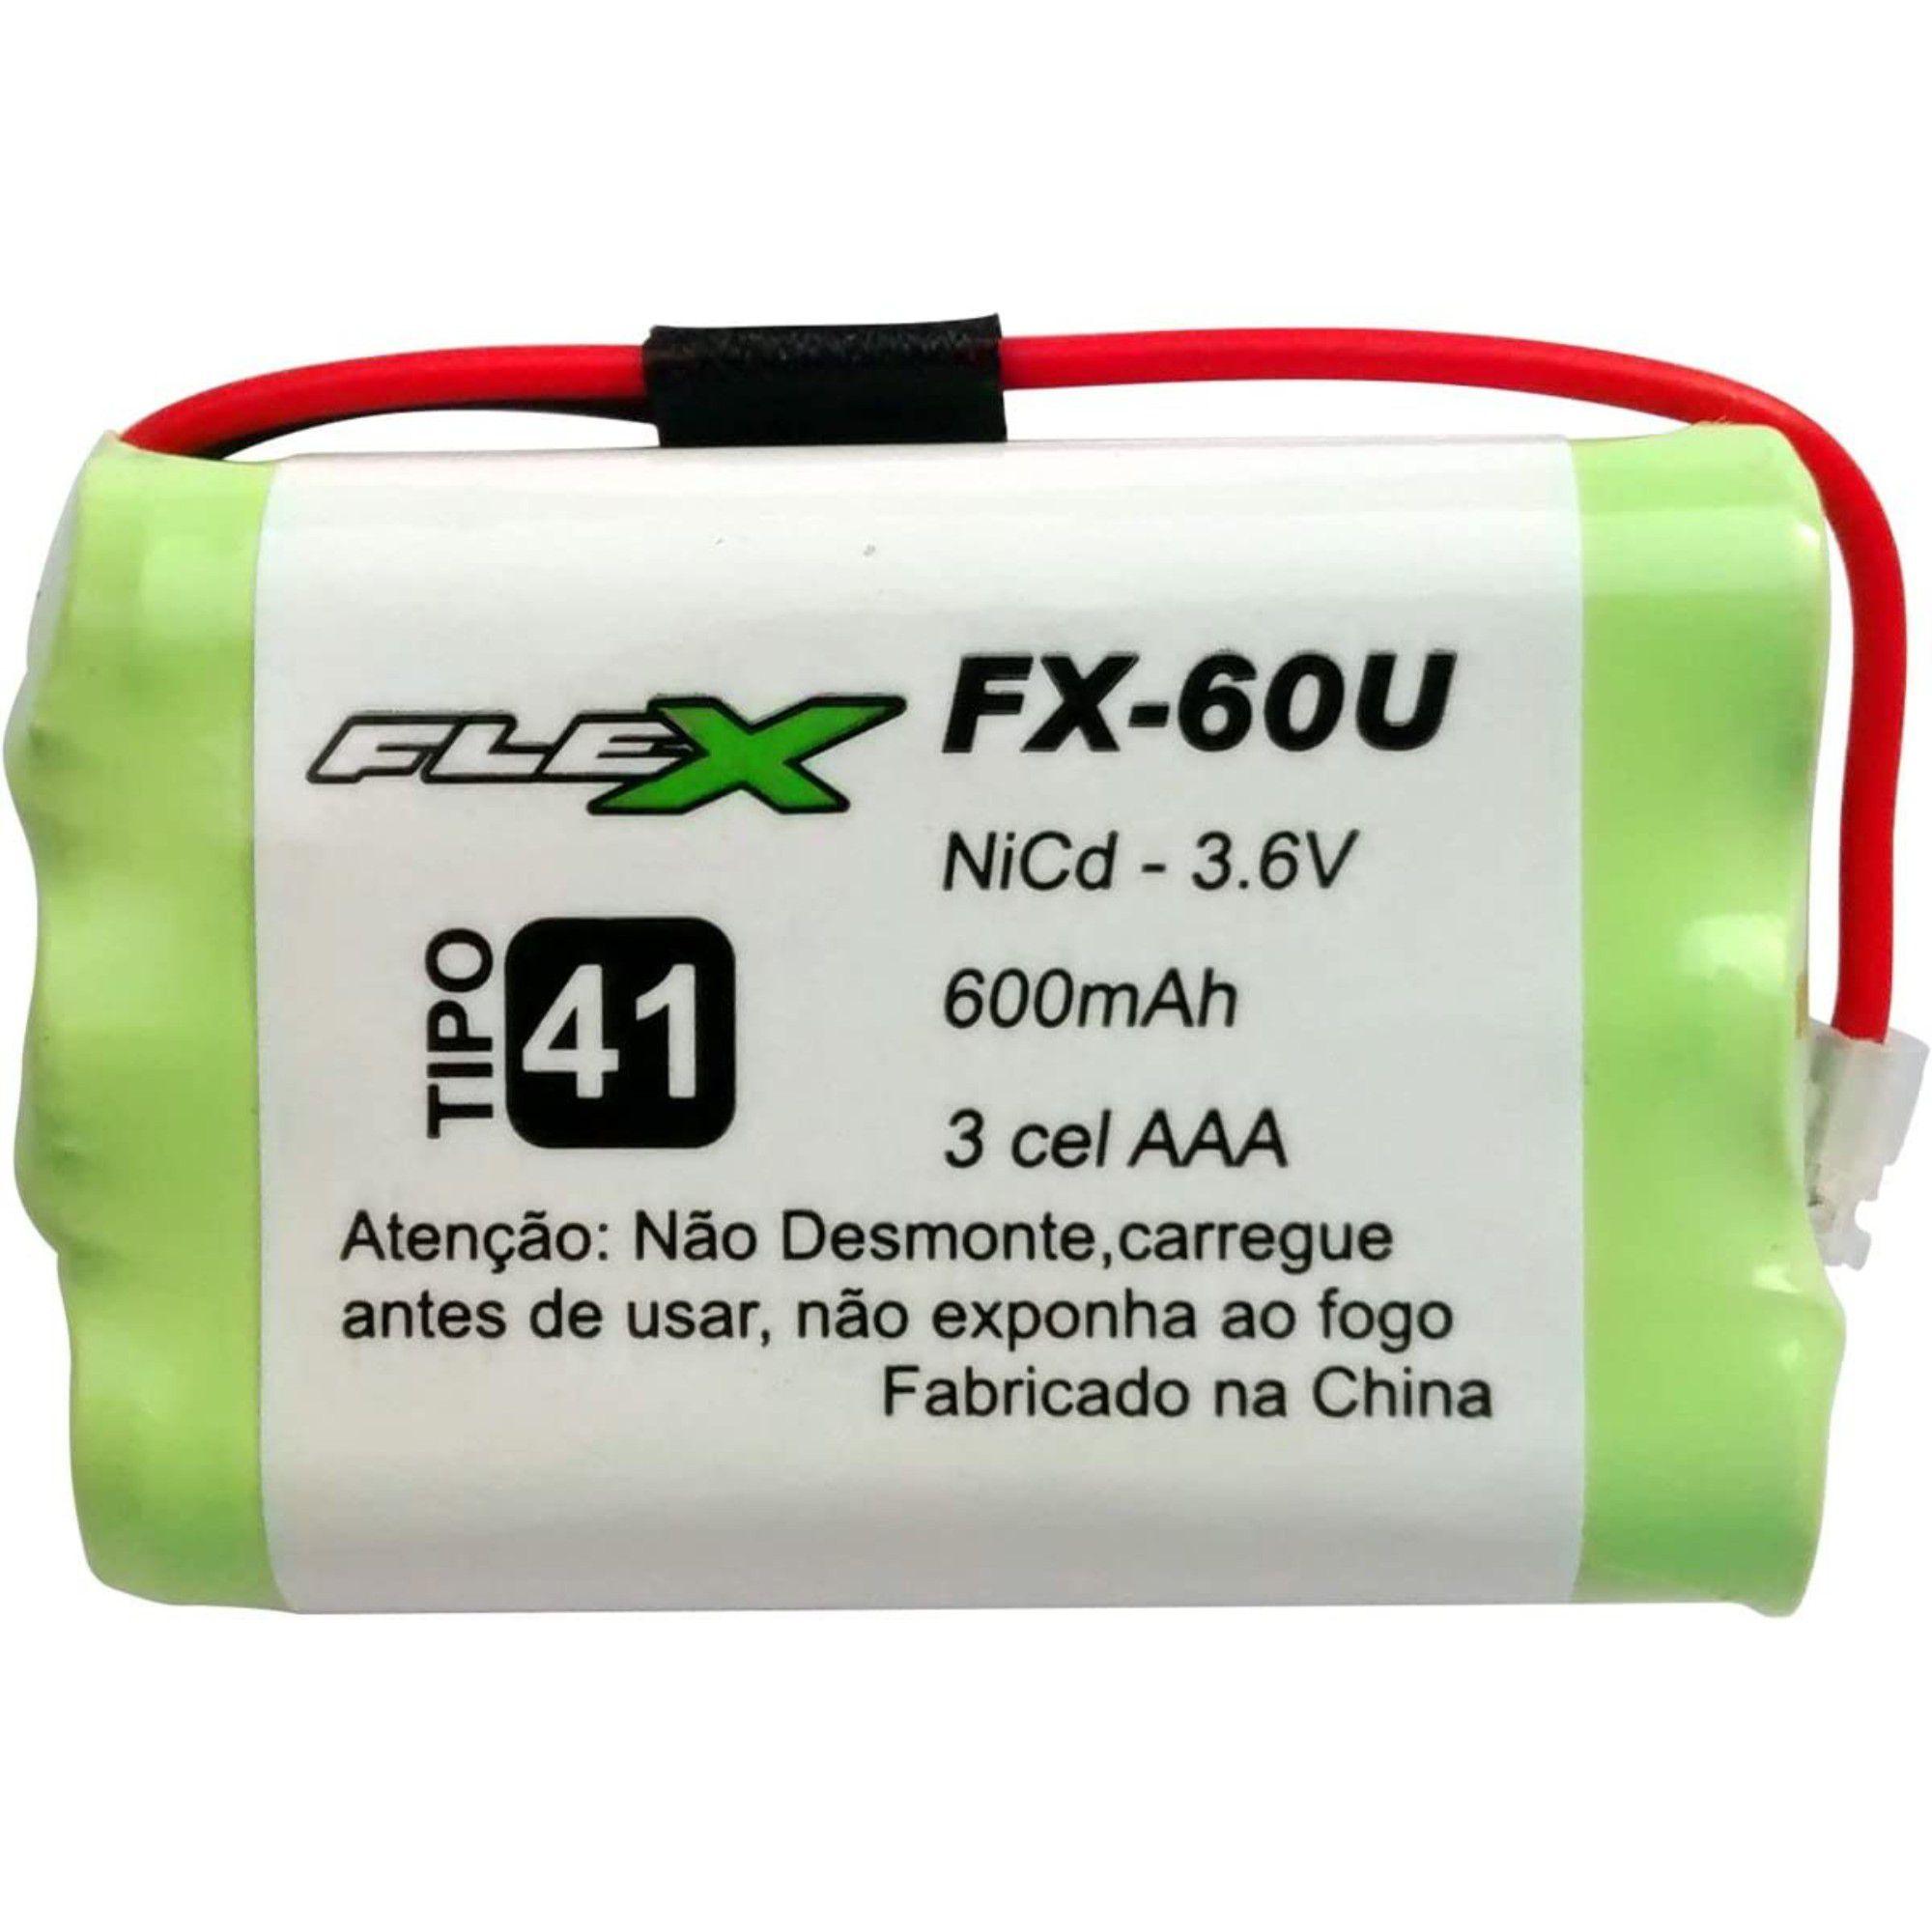 Bateria Telefone Sem Fio Ni-Cd 2.4v 600mah Fx-60u